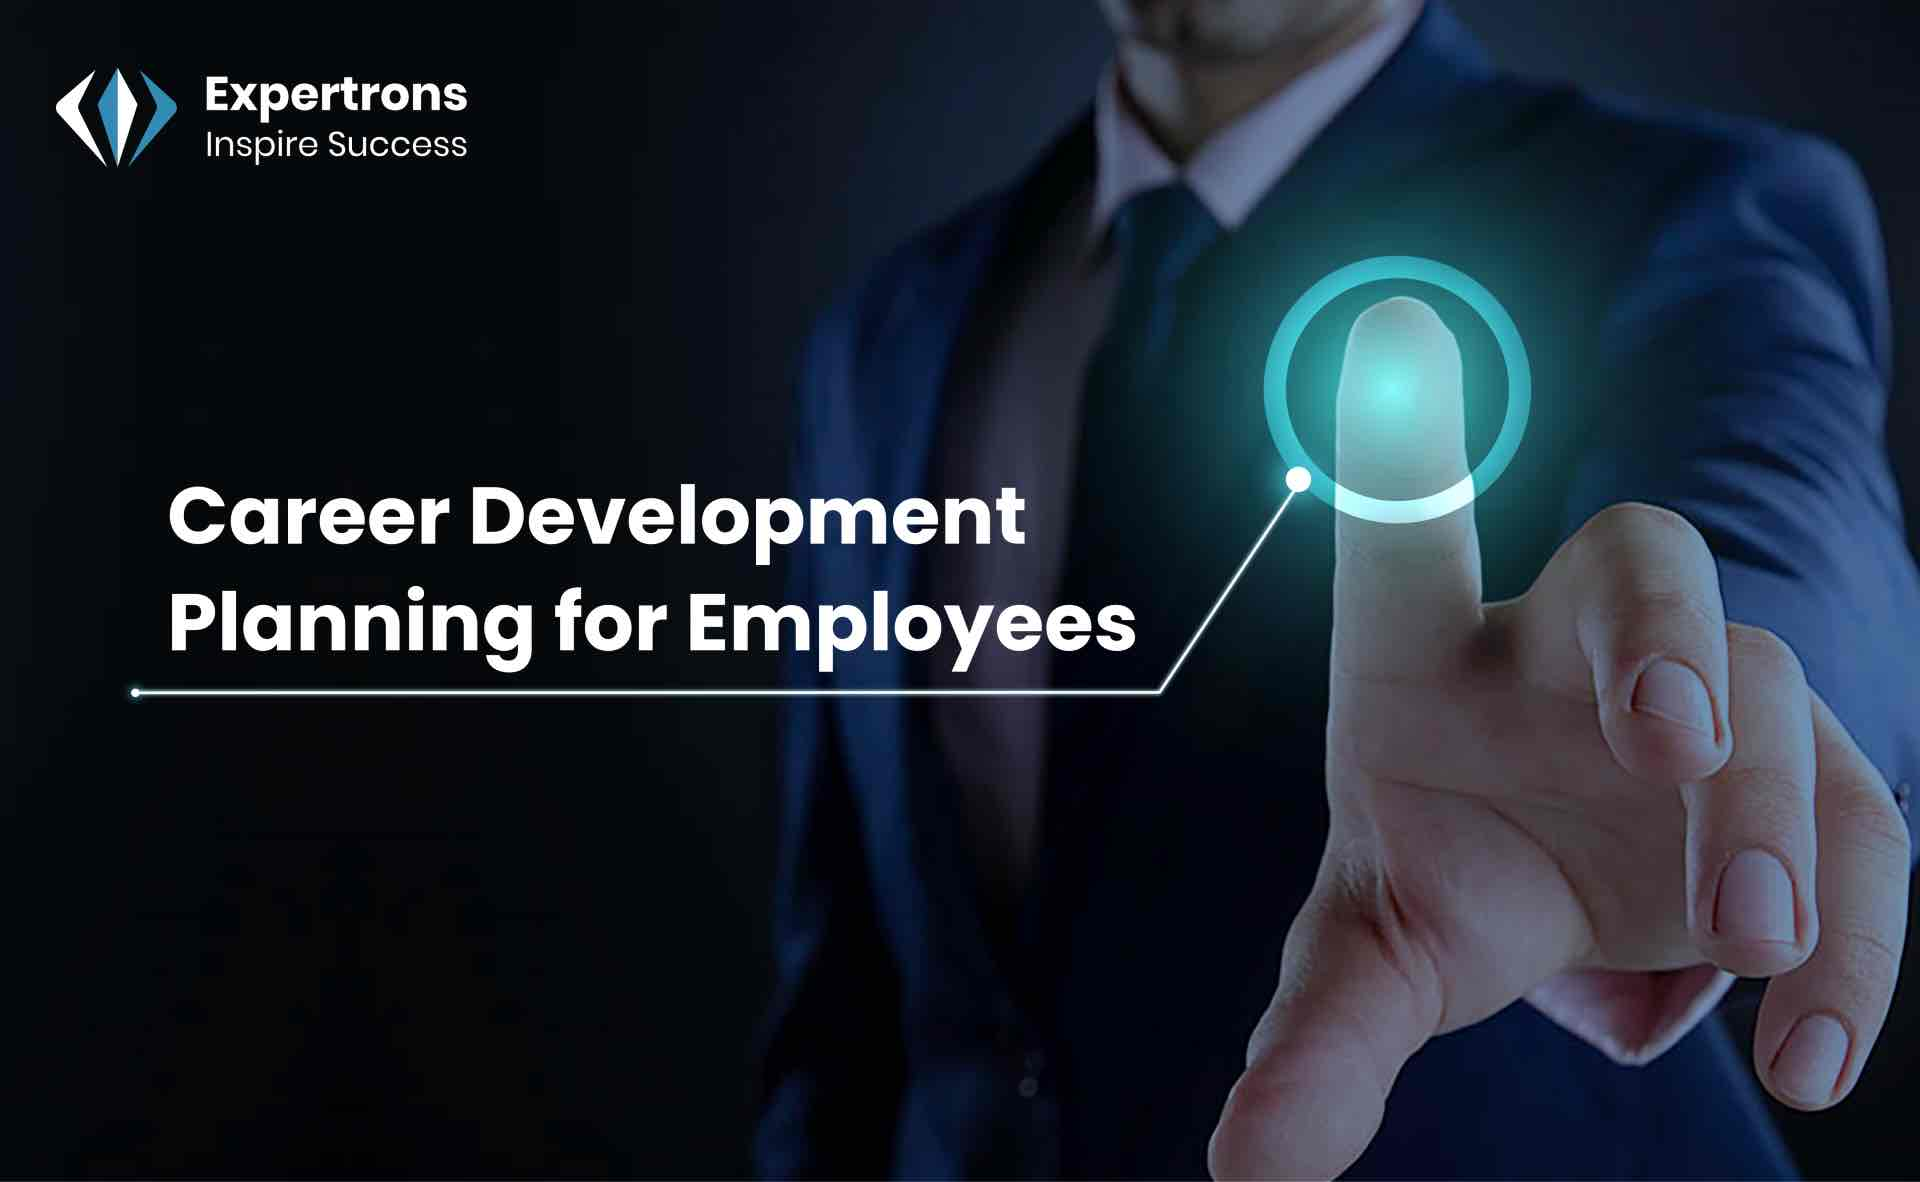 career development, career development planning, employees